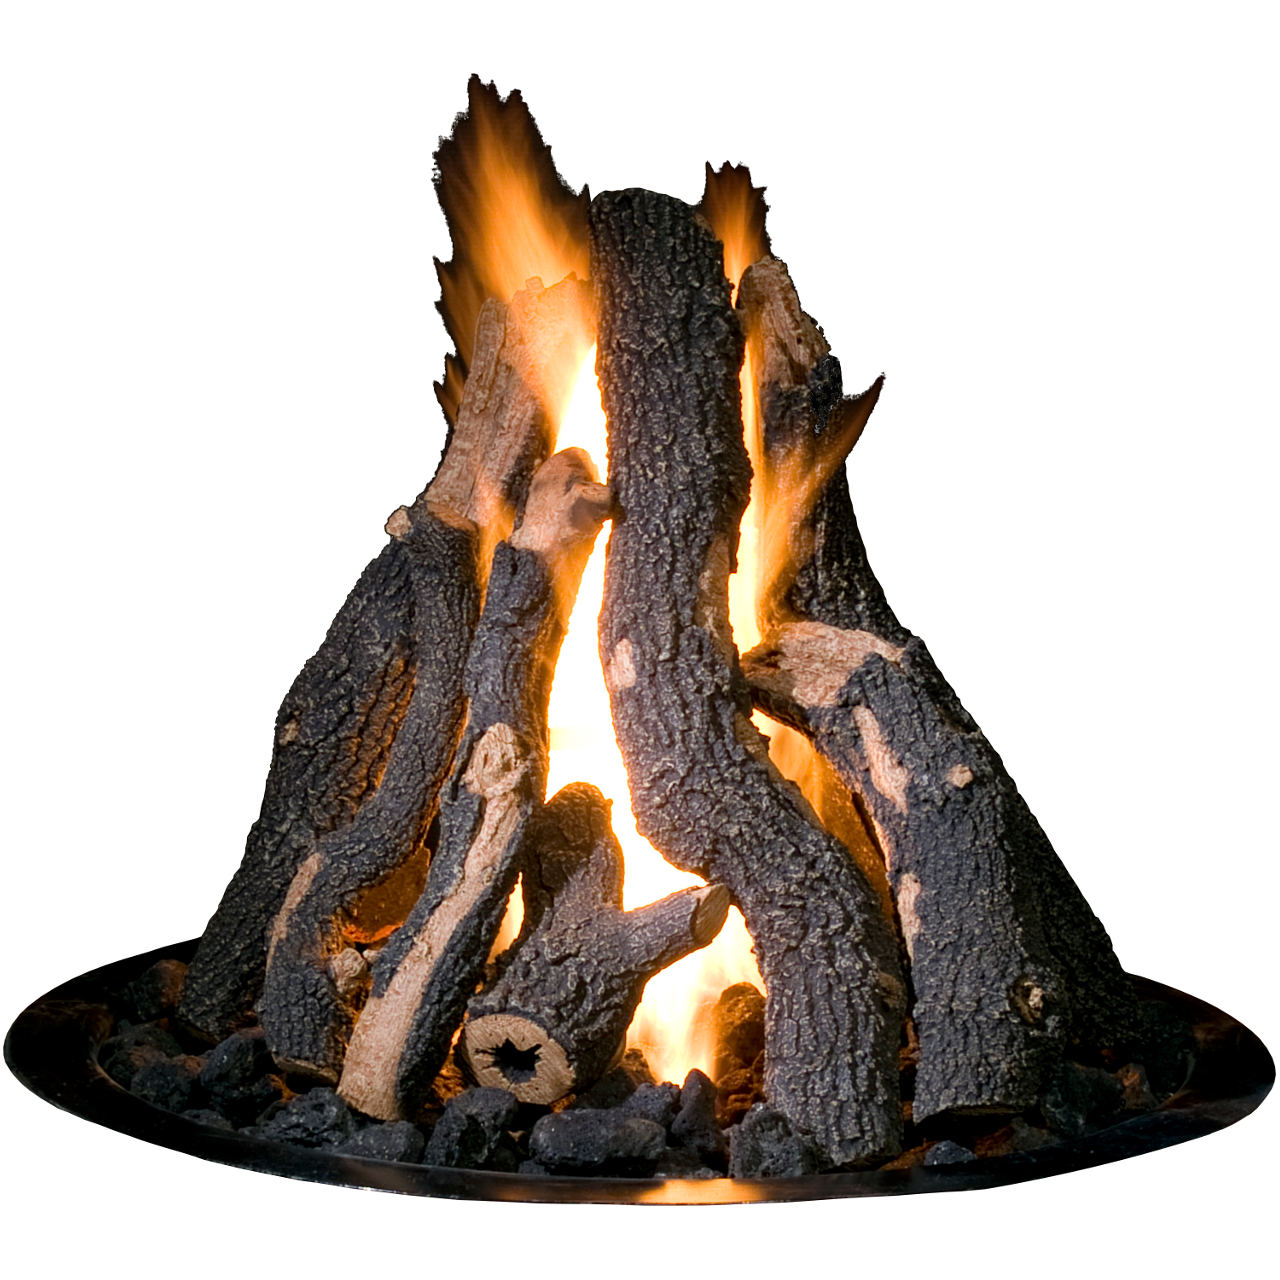 "Golden Blount Logs For 24"" Grand Fire Pit Pan"